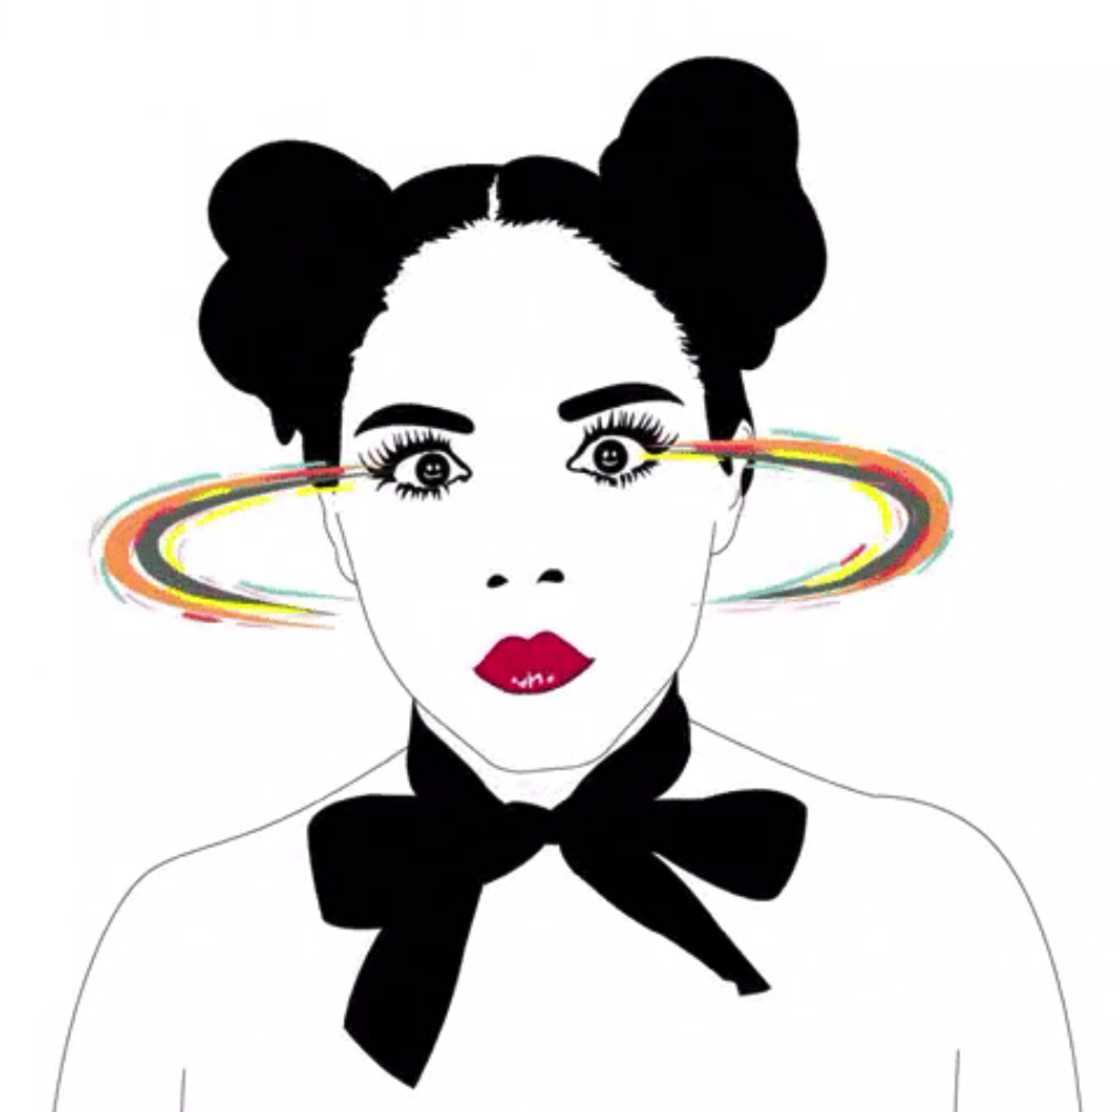 Les GIFs animes sensuels de Xaviera Lopez